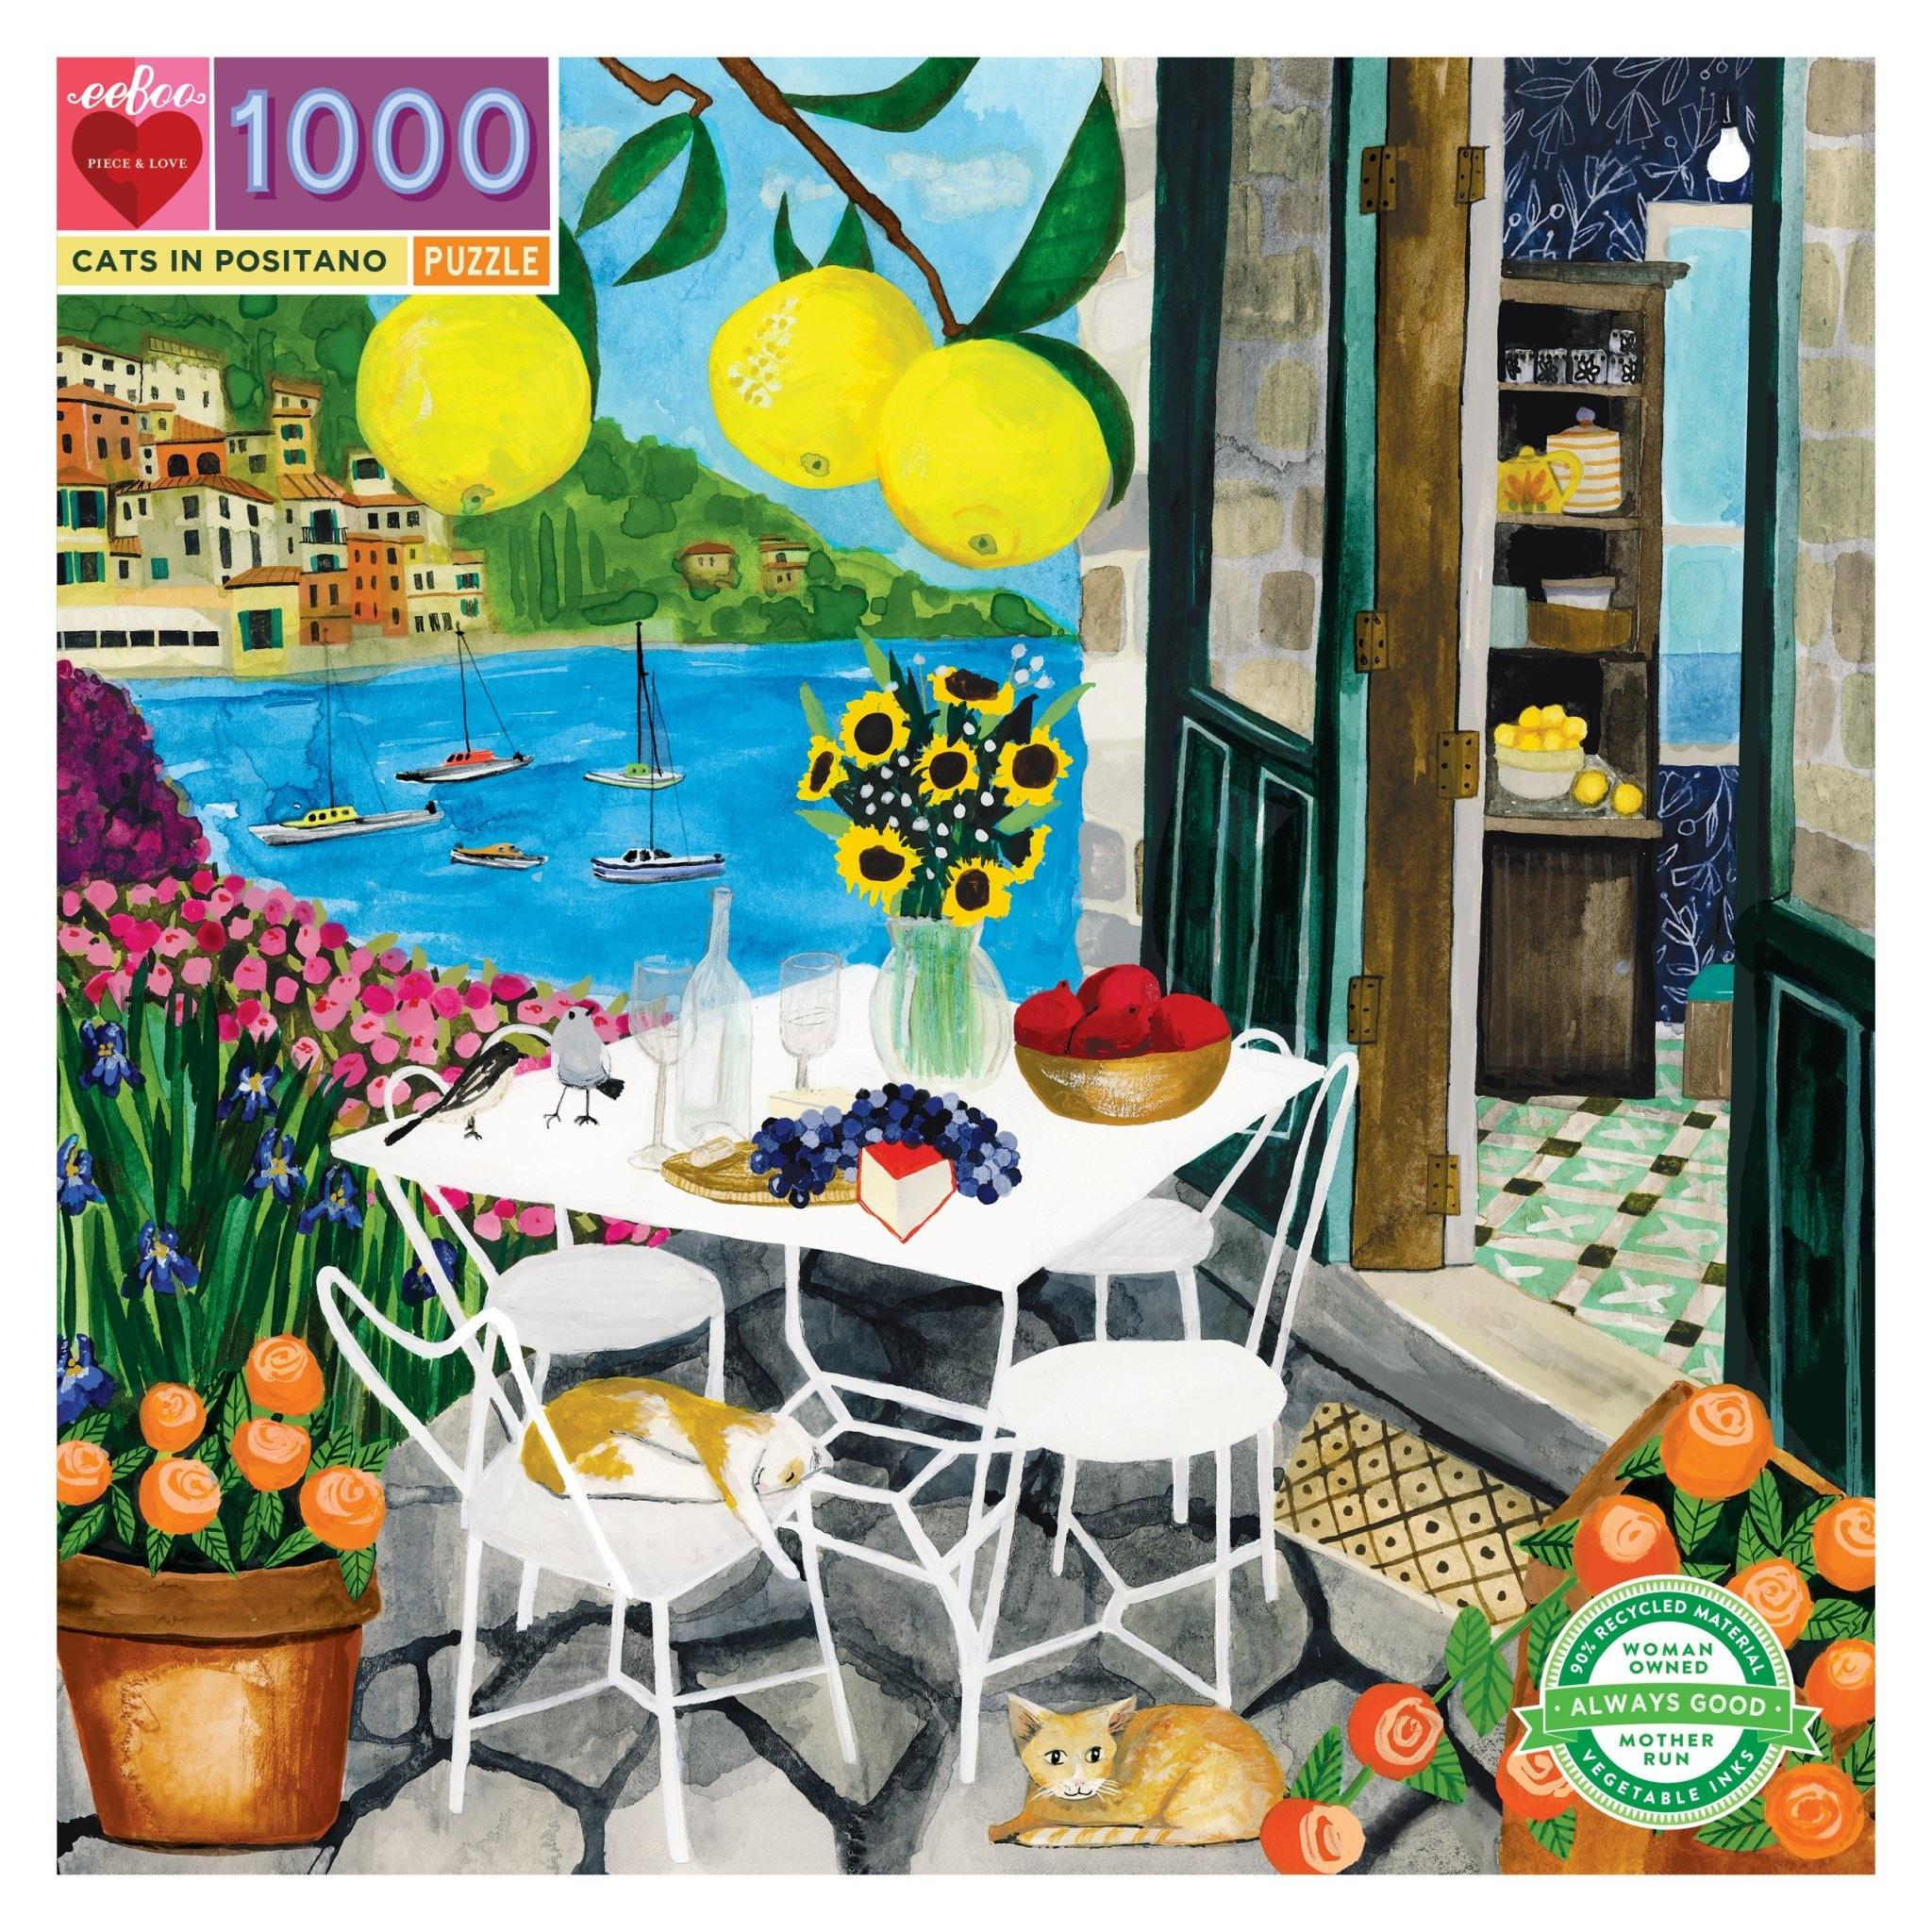 Cats in Positano (1000 Piece Puzzle)